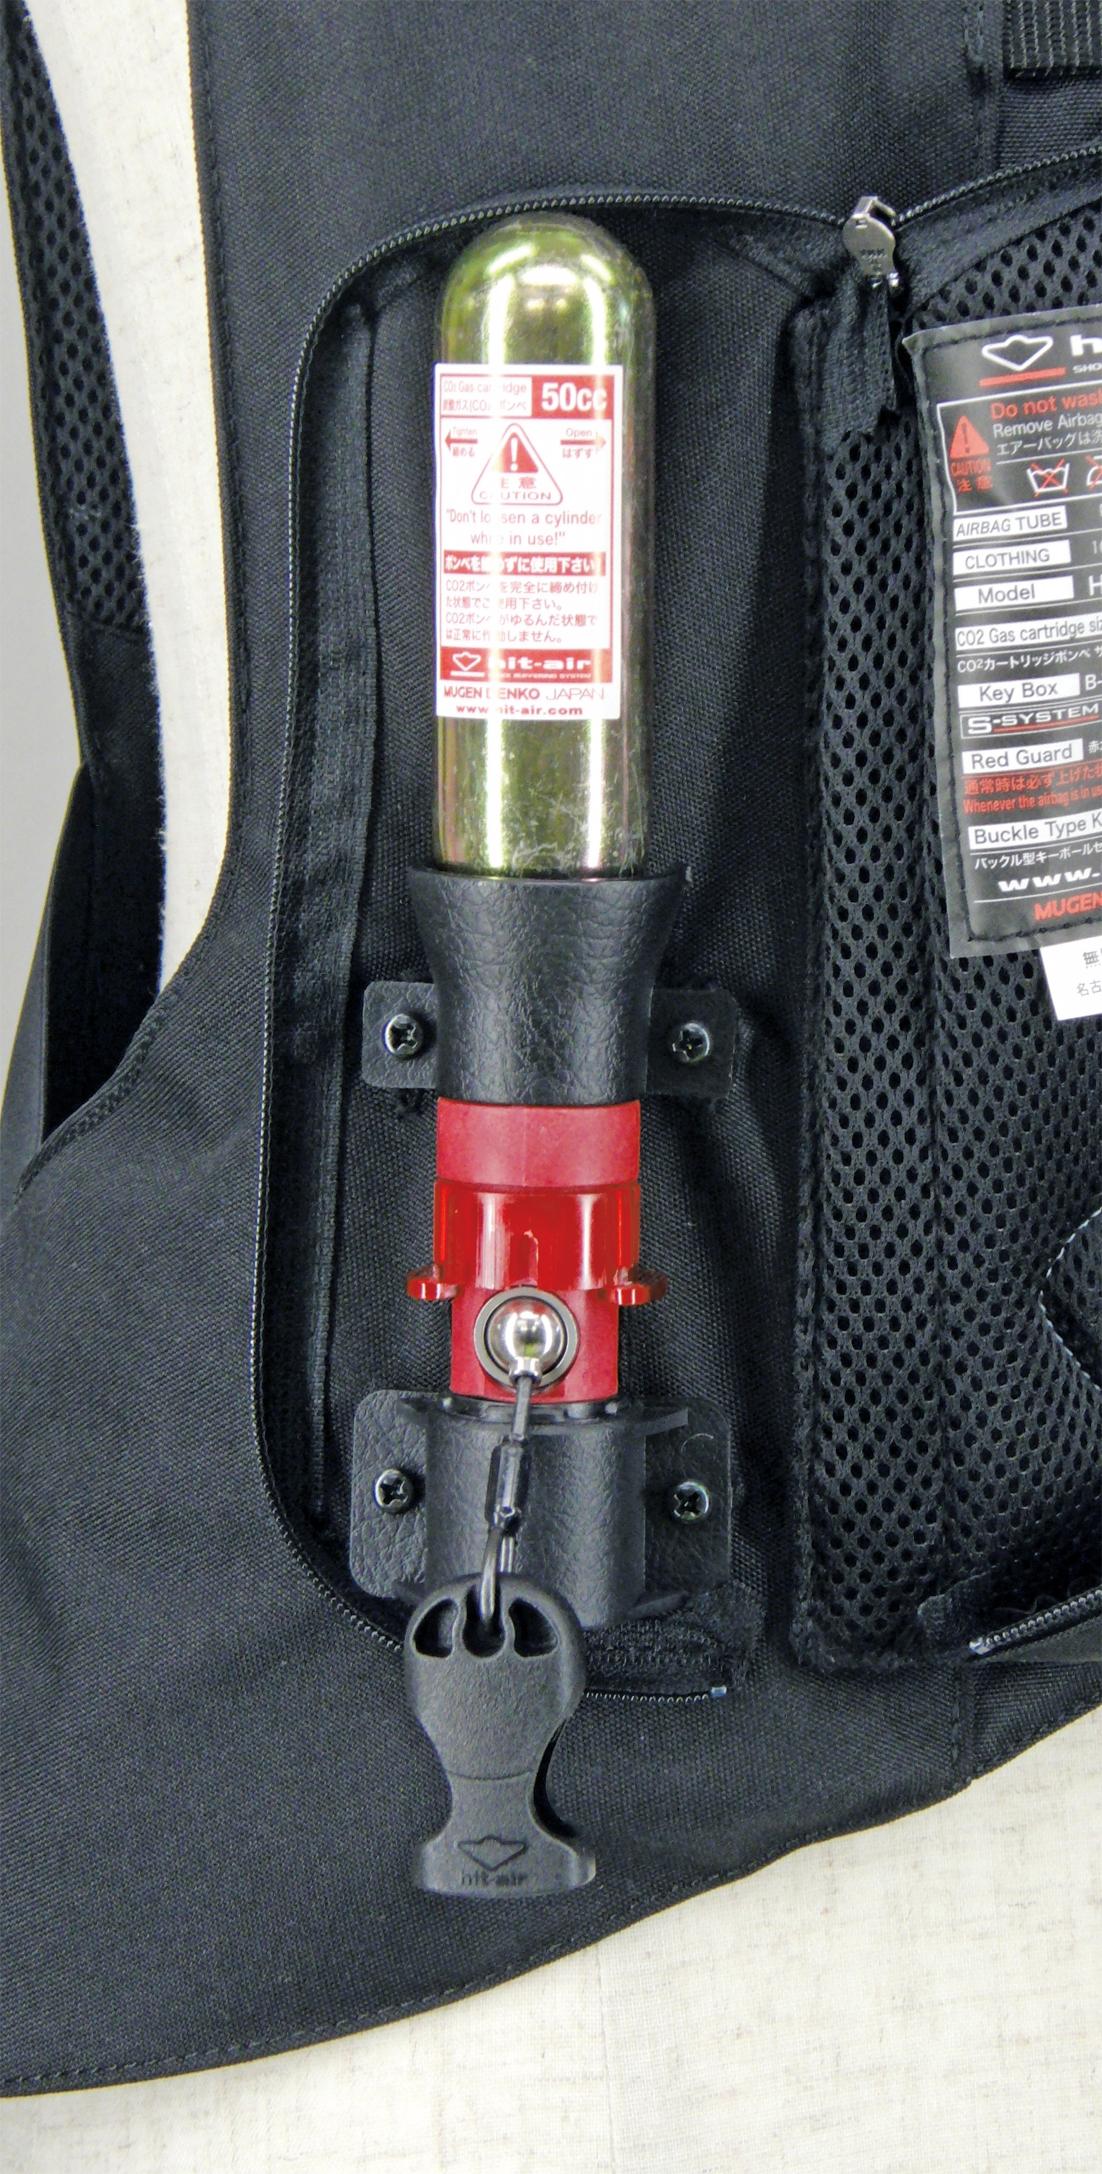 keybox-bk-50cc